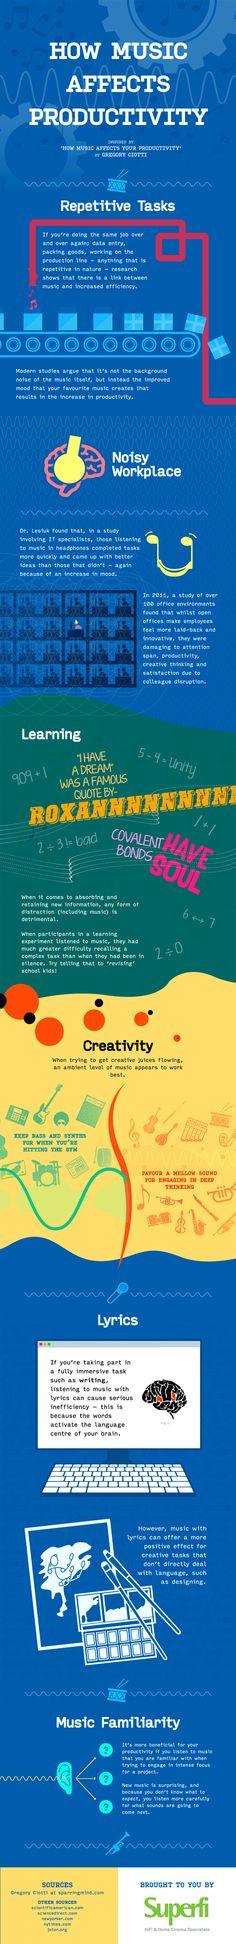 How Music Affects Productivity via Mental Floss